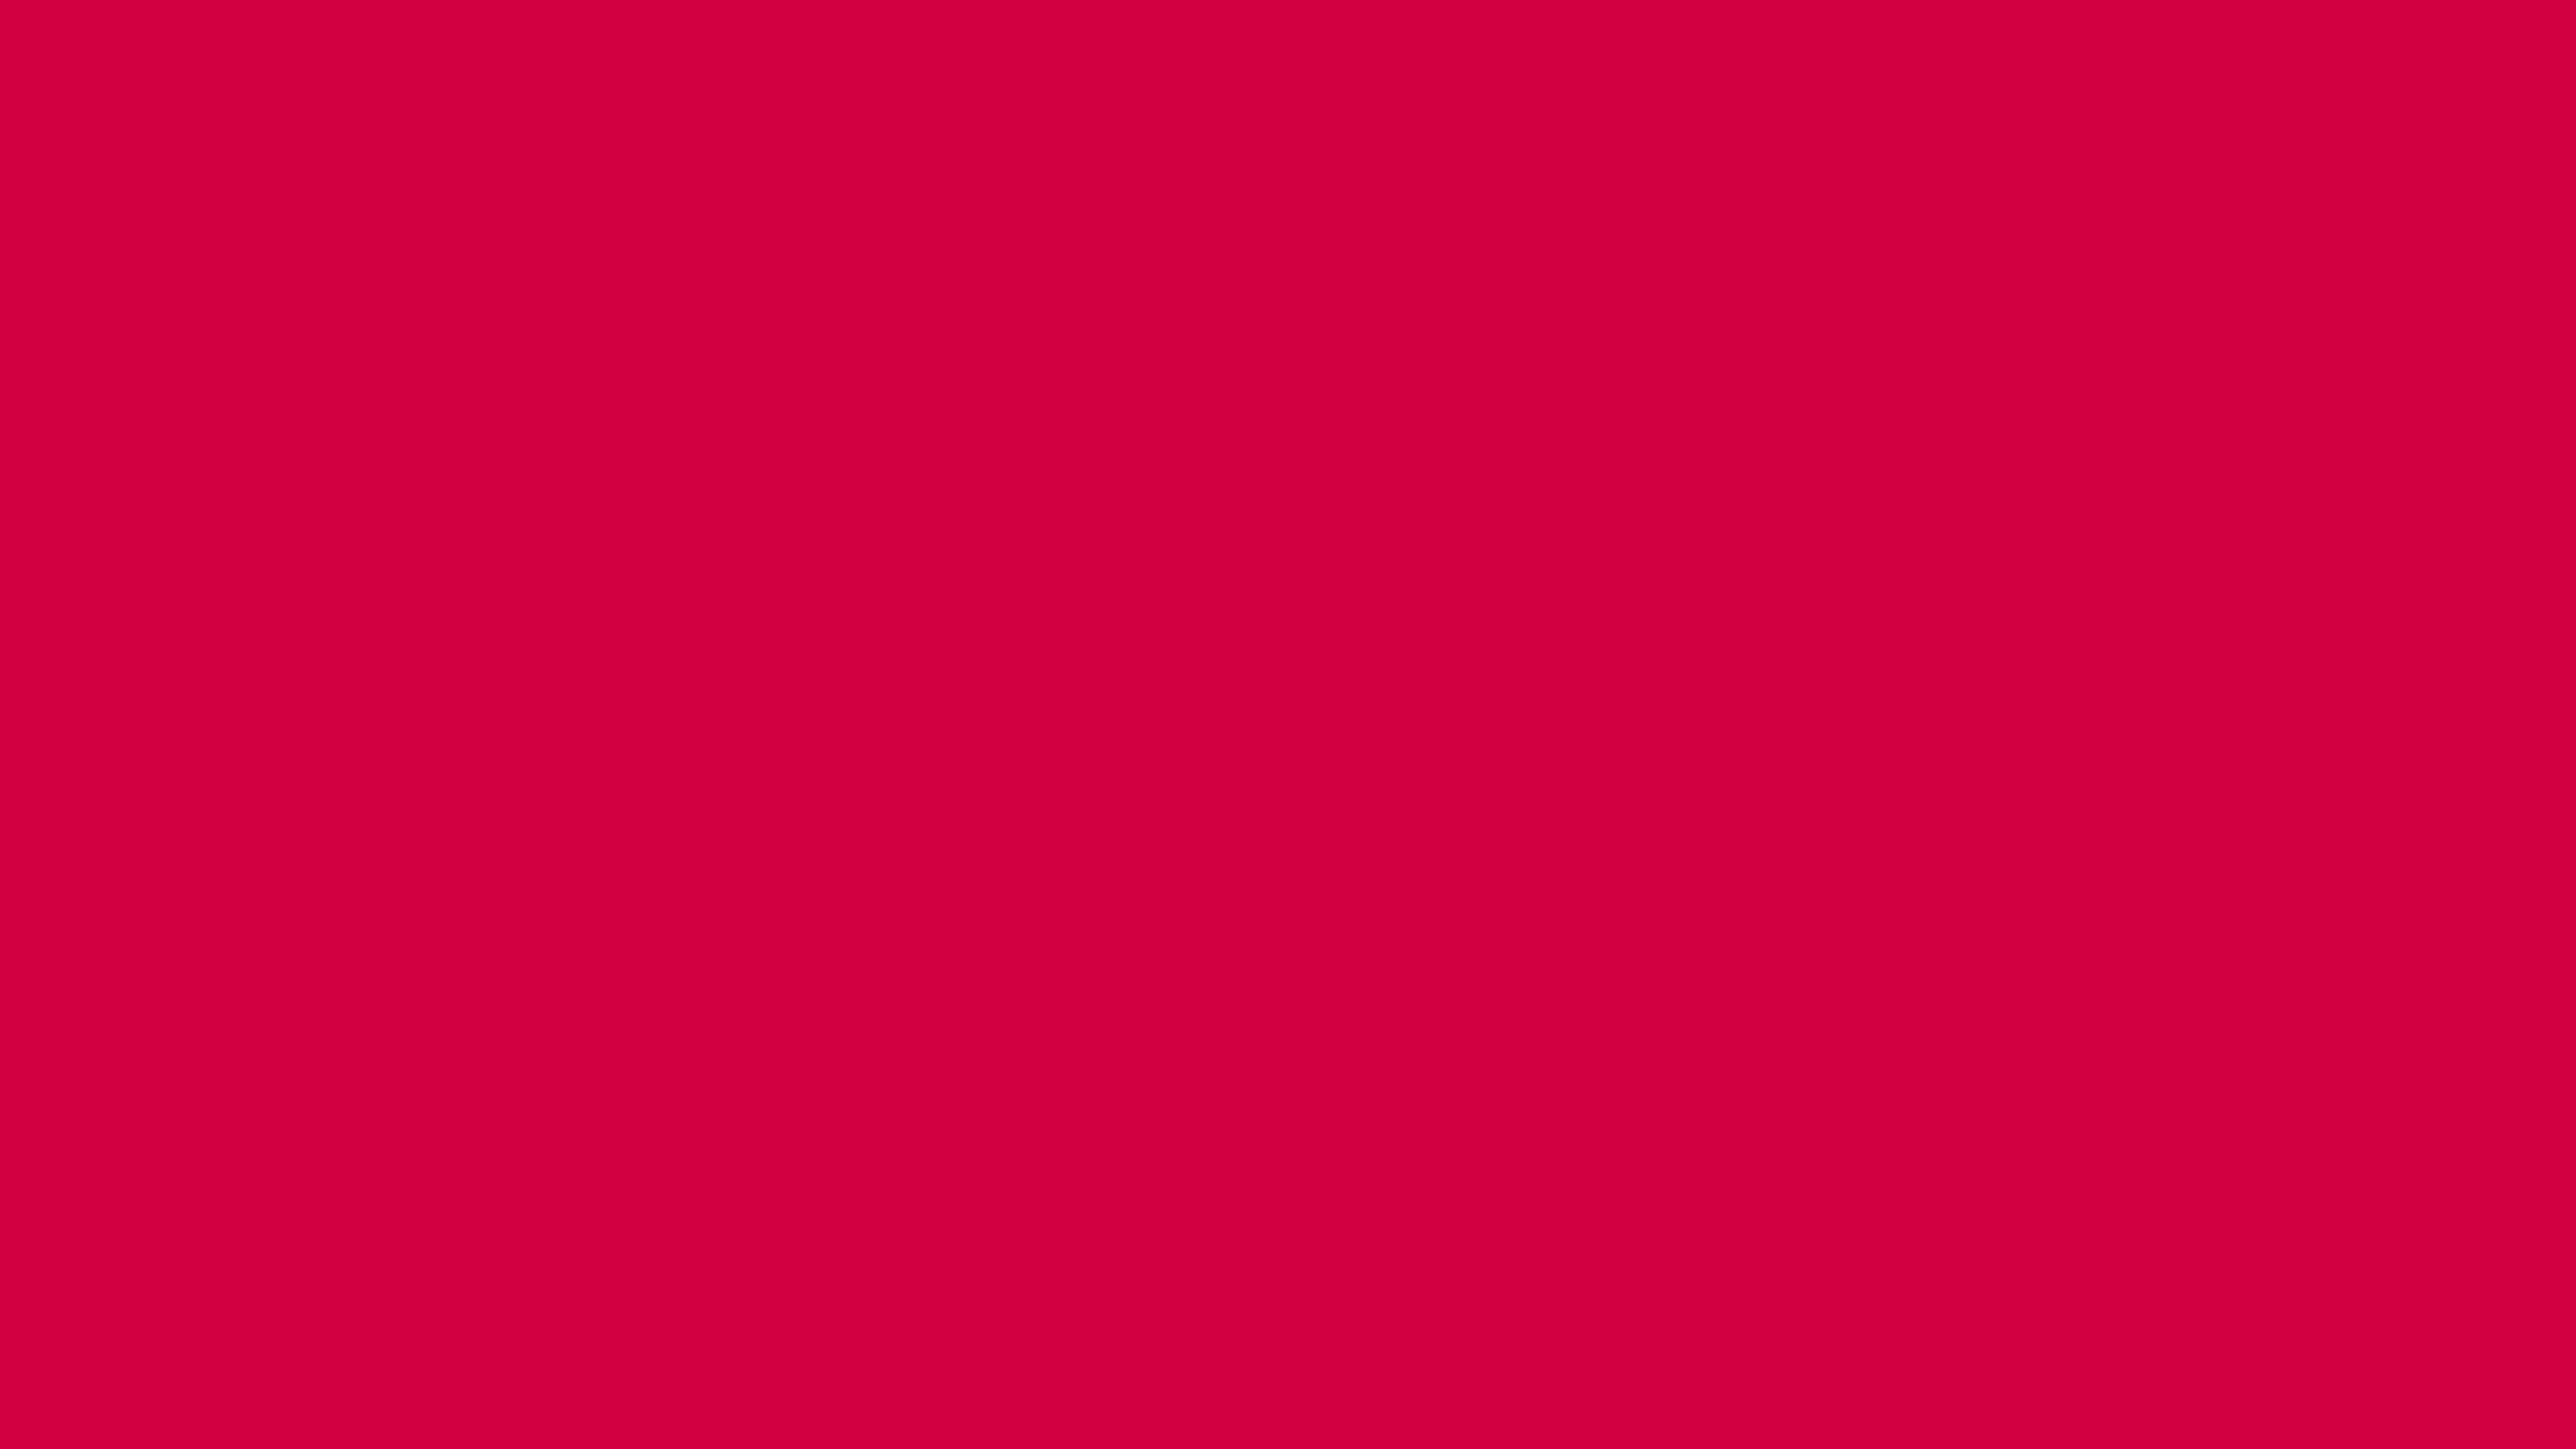 5120x2880 Utah Crimson Solid Color Background